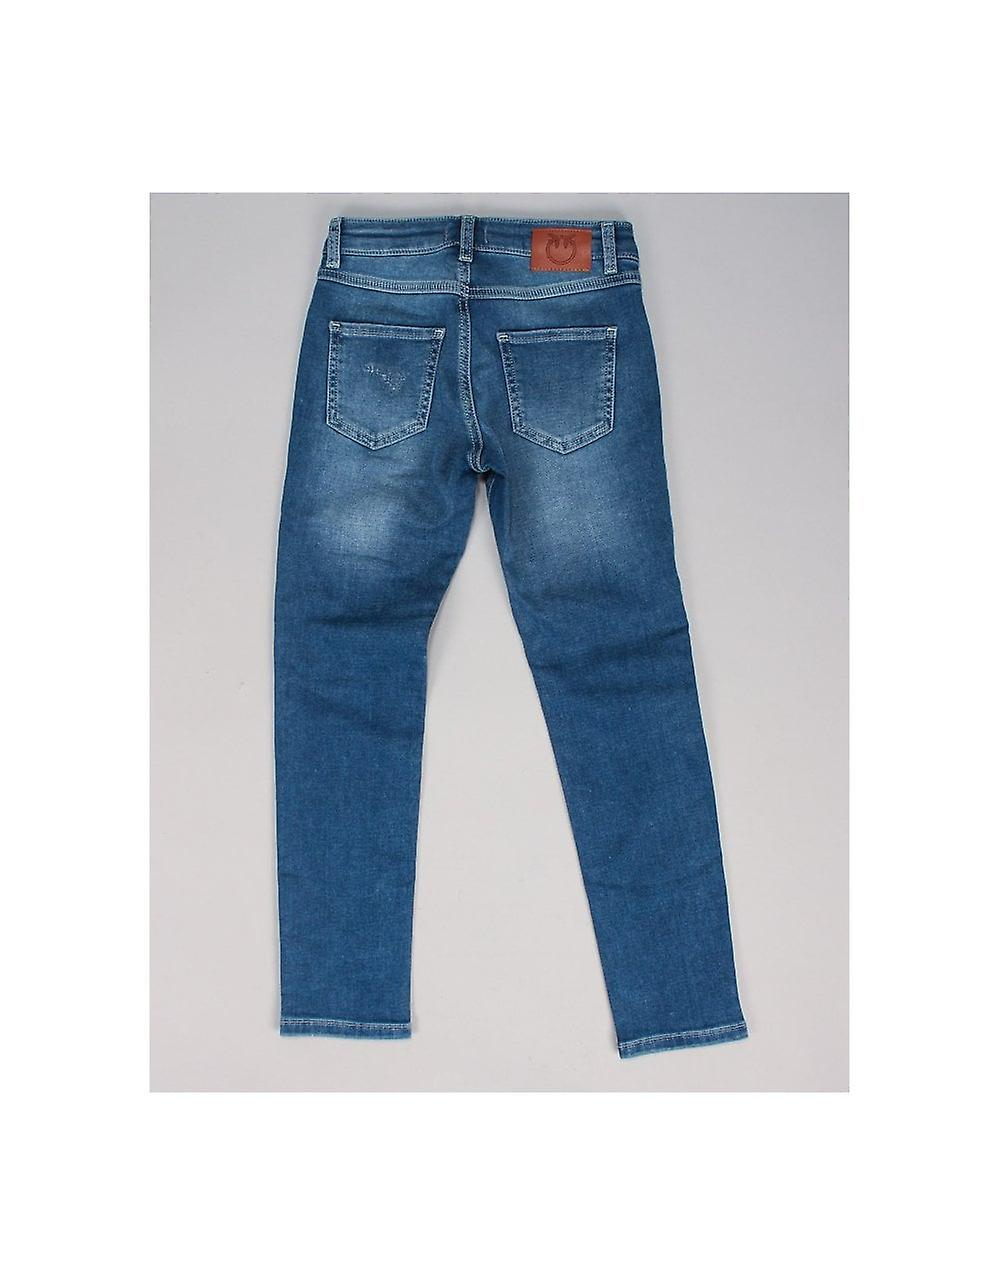 Pinko Madeleine Rip Repair Jeans